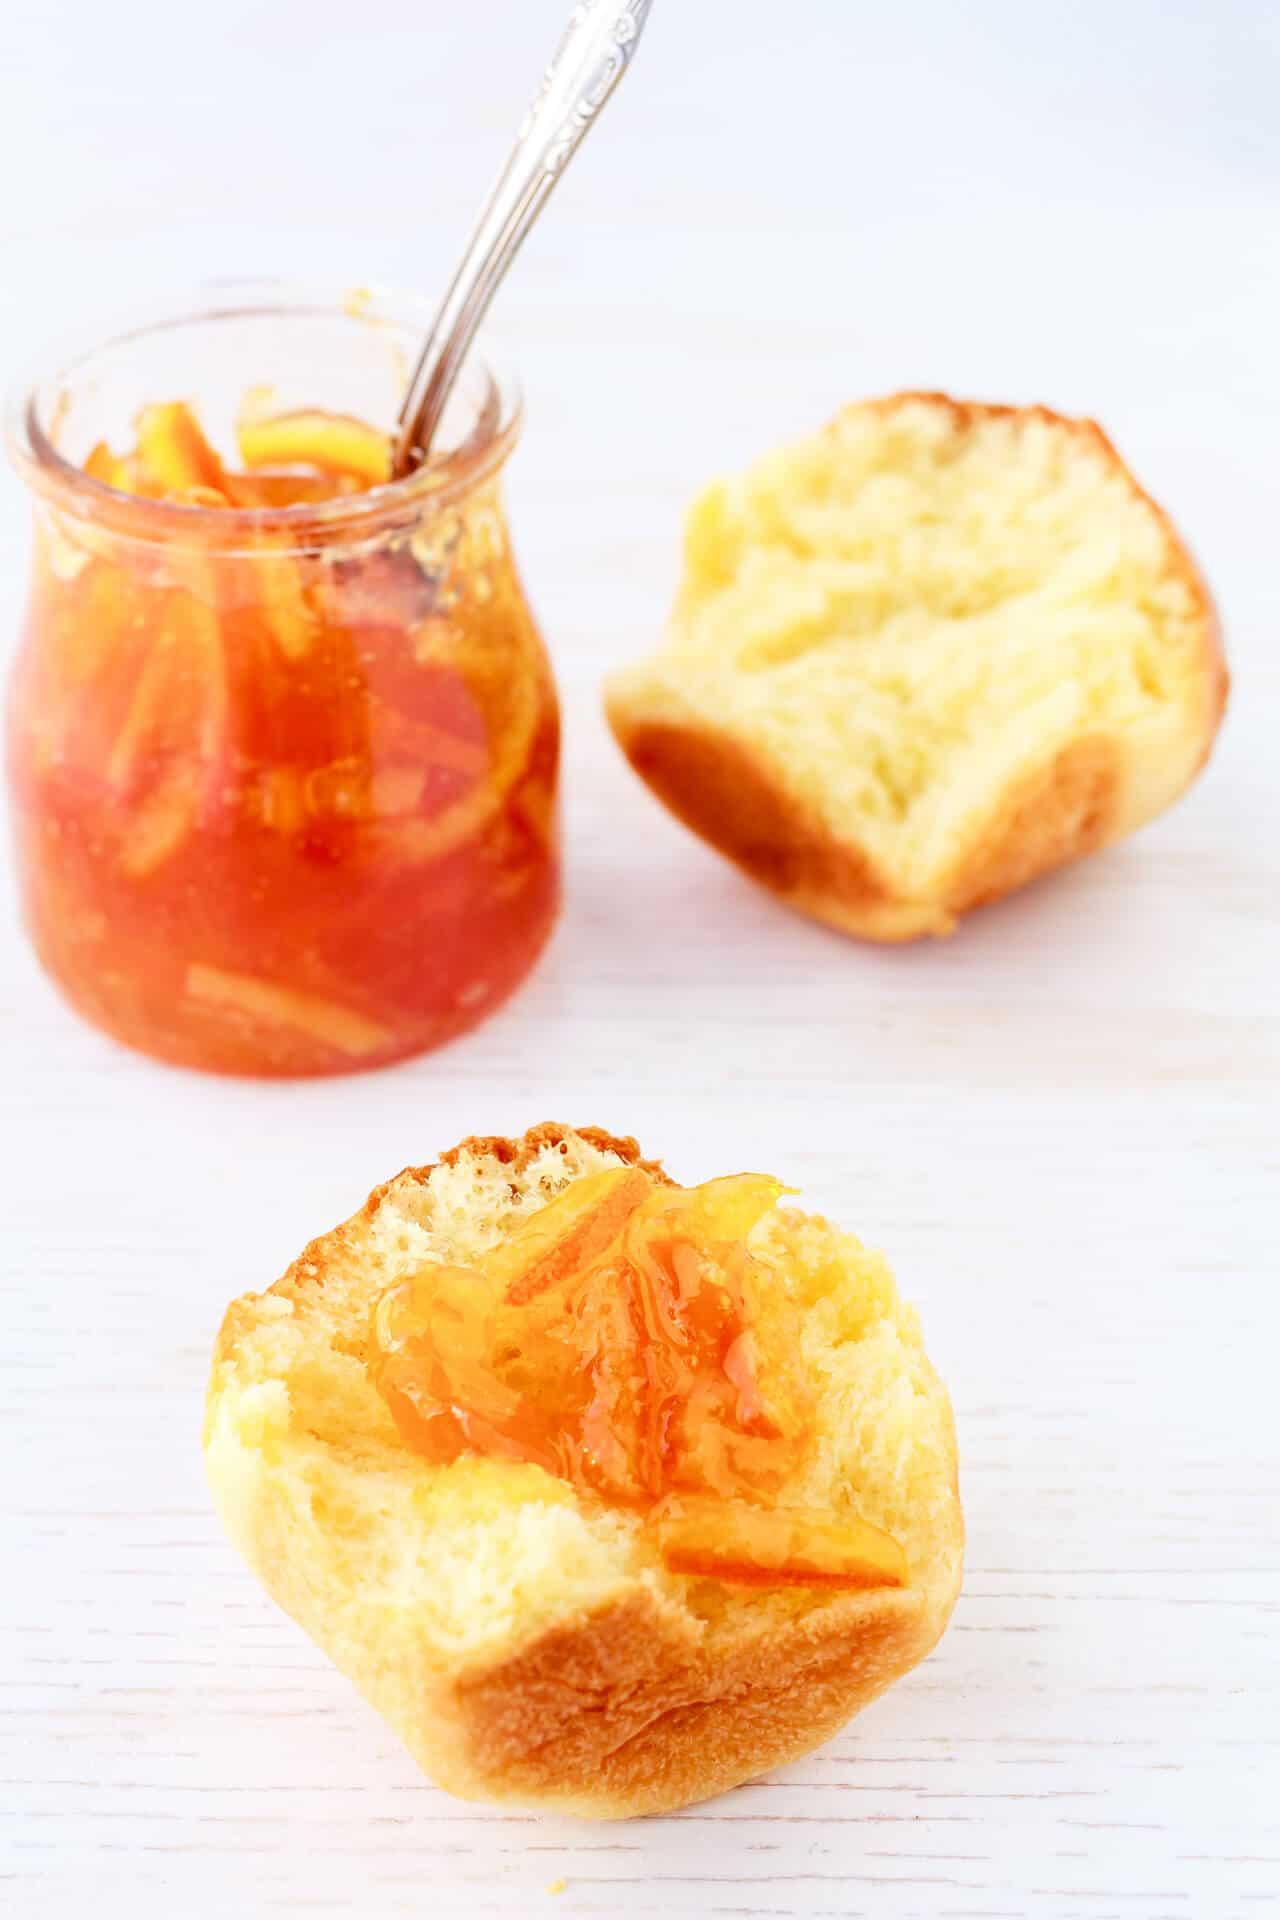 A jar of marmalade served with a brioche bun